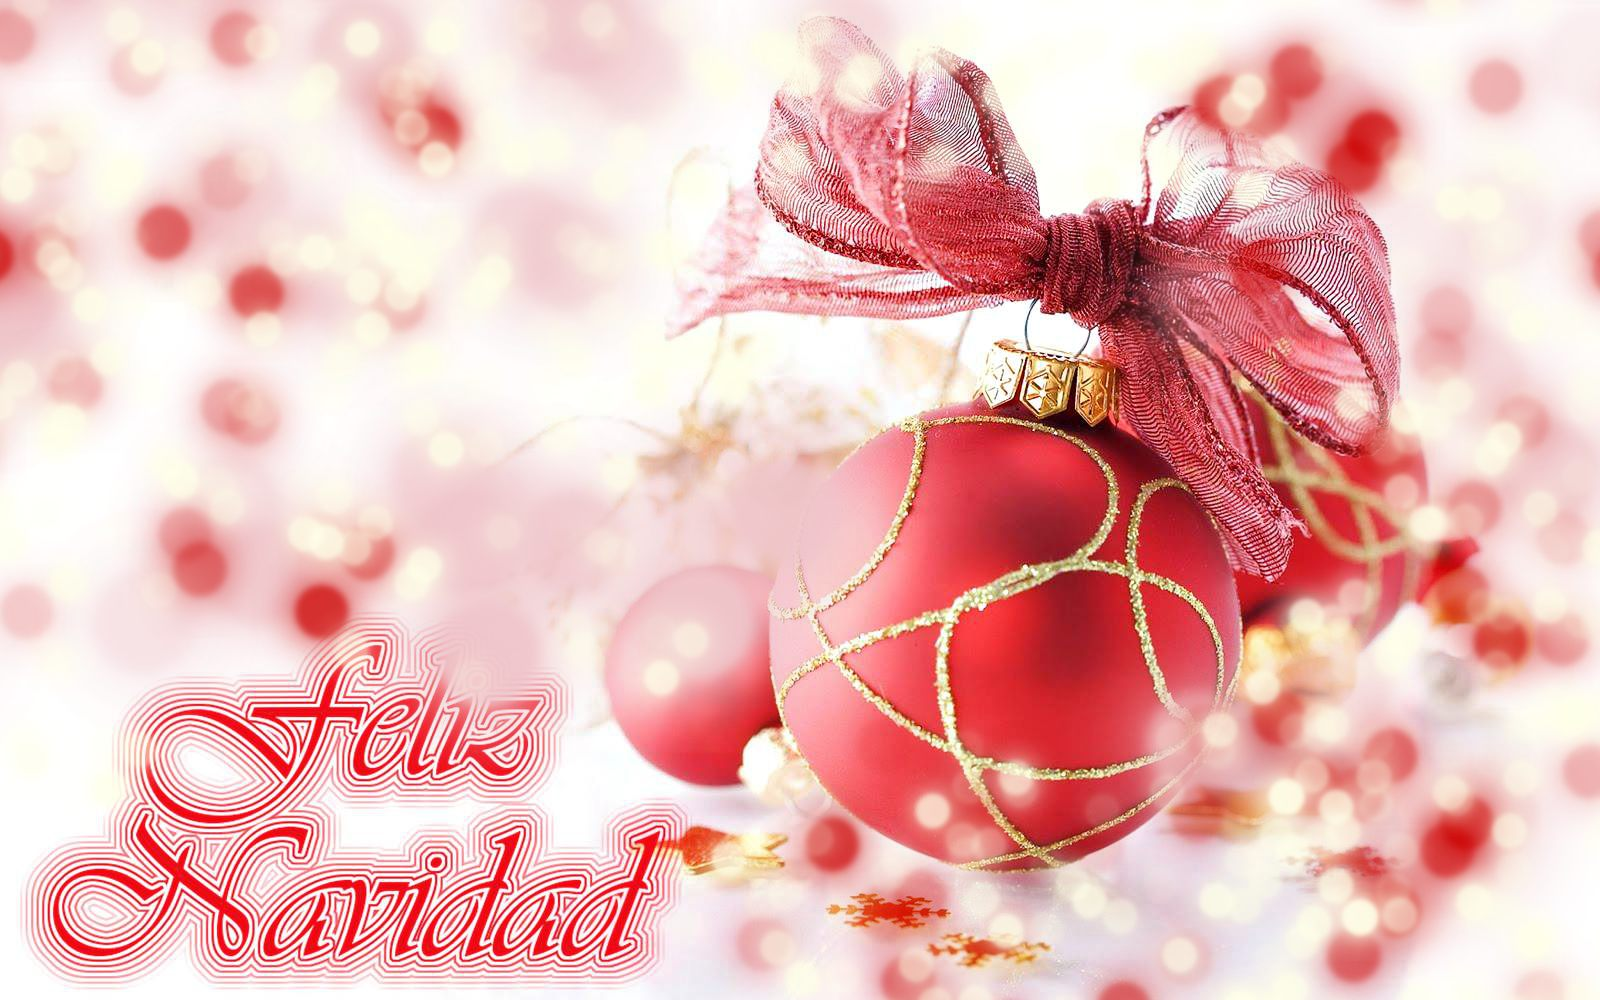 Navidad Wallpaper 3d Tarjetas De Navidad Tarjetas Navide 241 As Para Felicitar Las